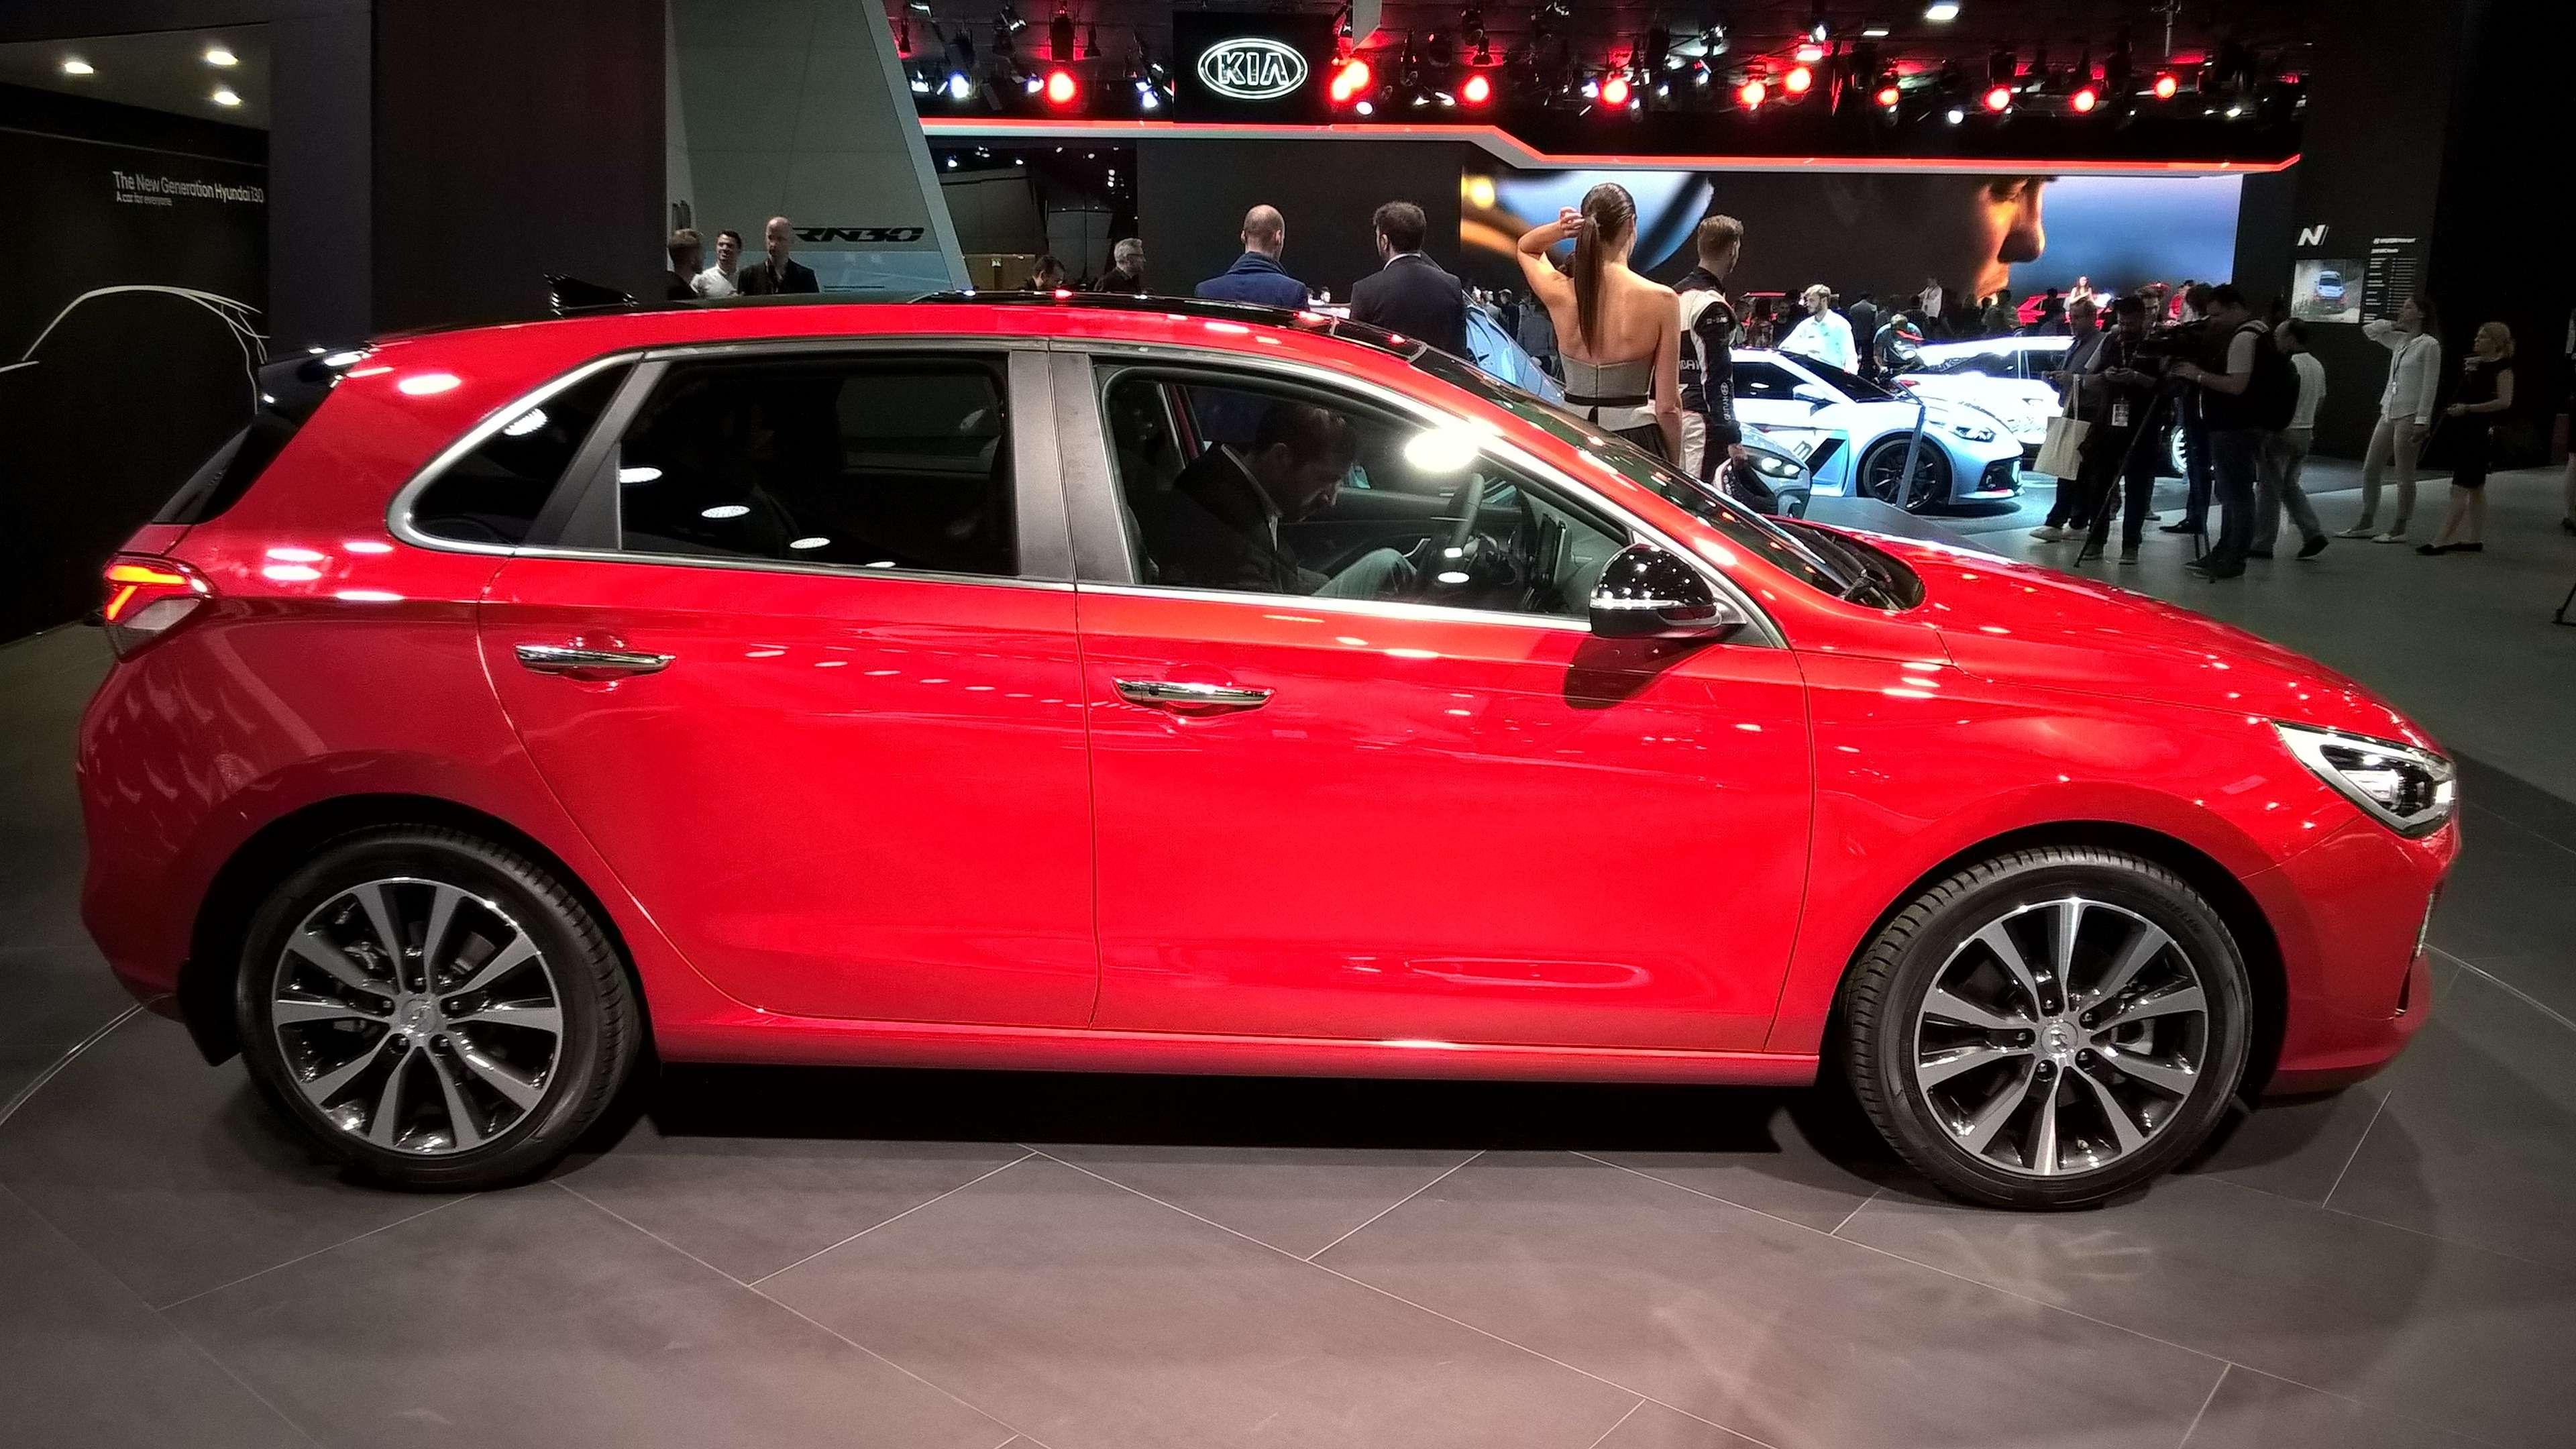 В тени концепта: вПариже дебютировал новый Hyundai i30— фото 642328